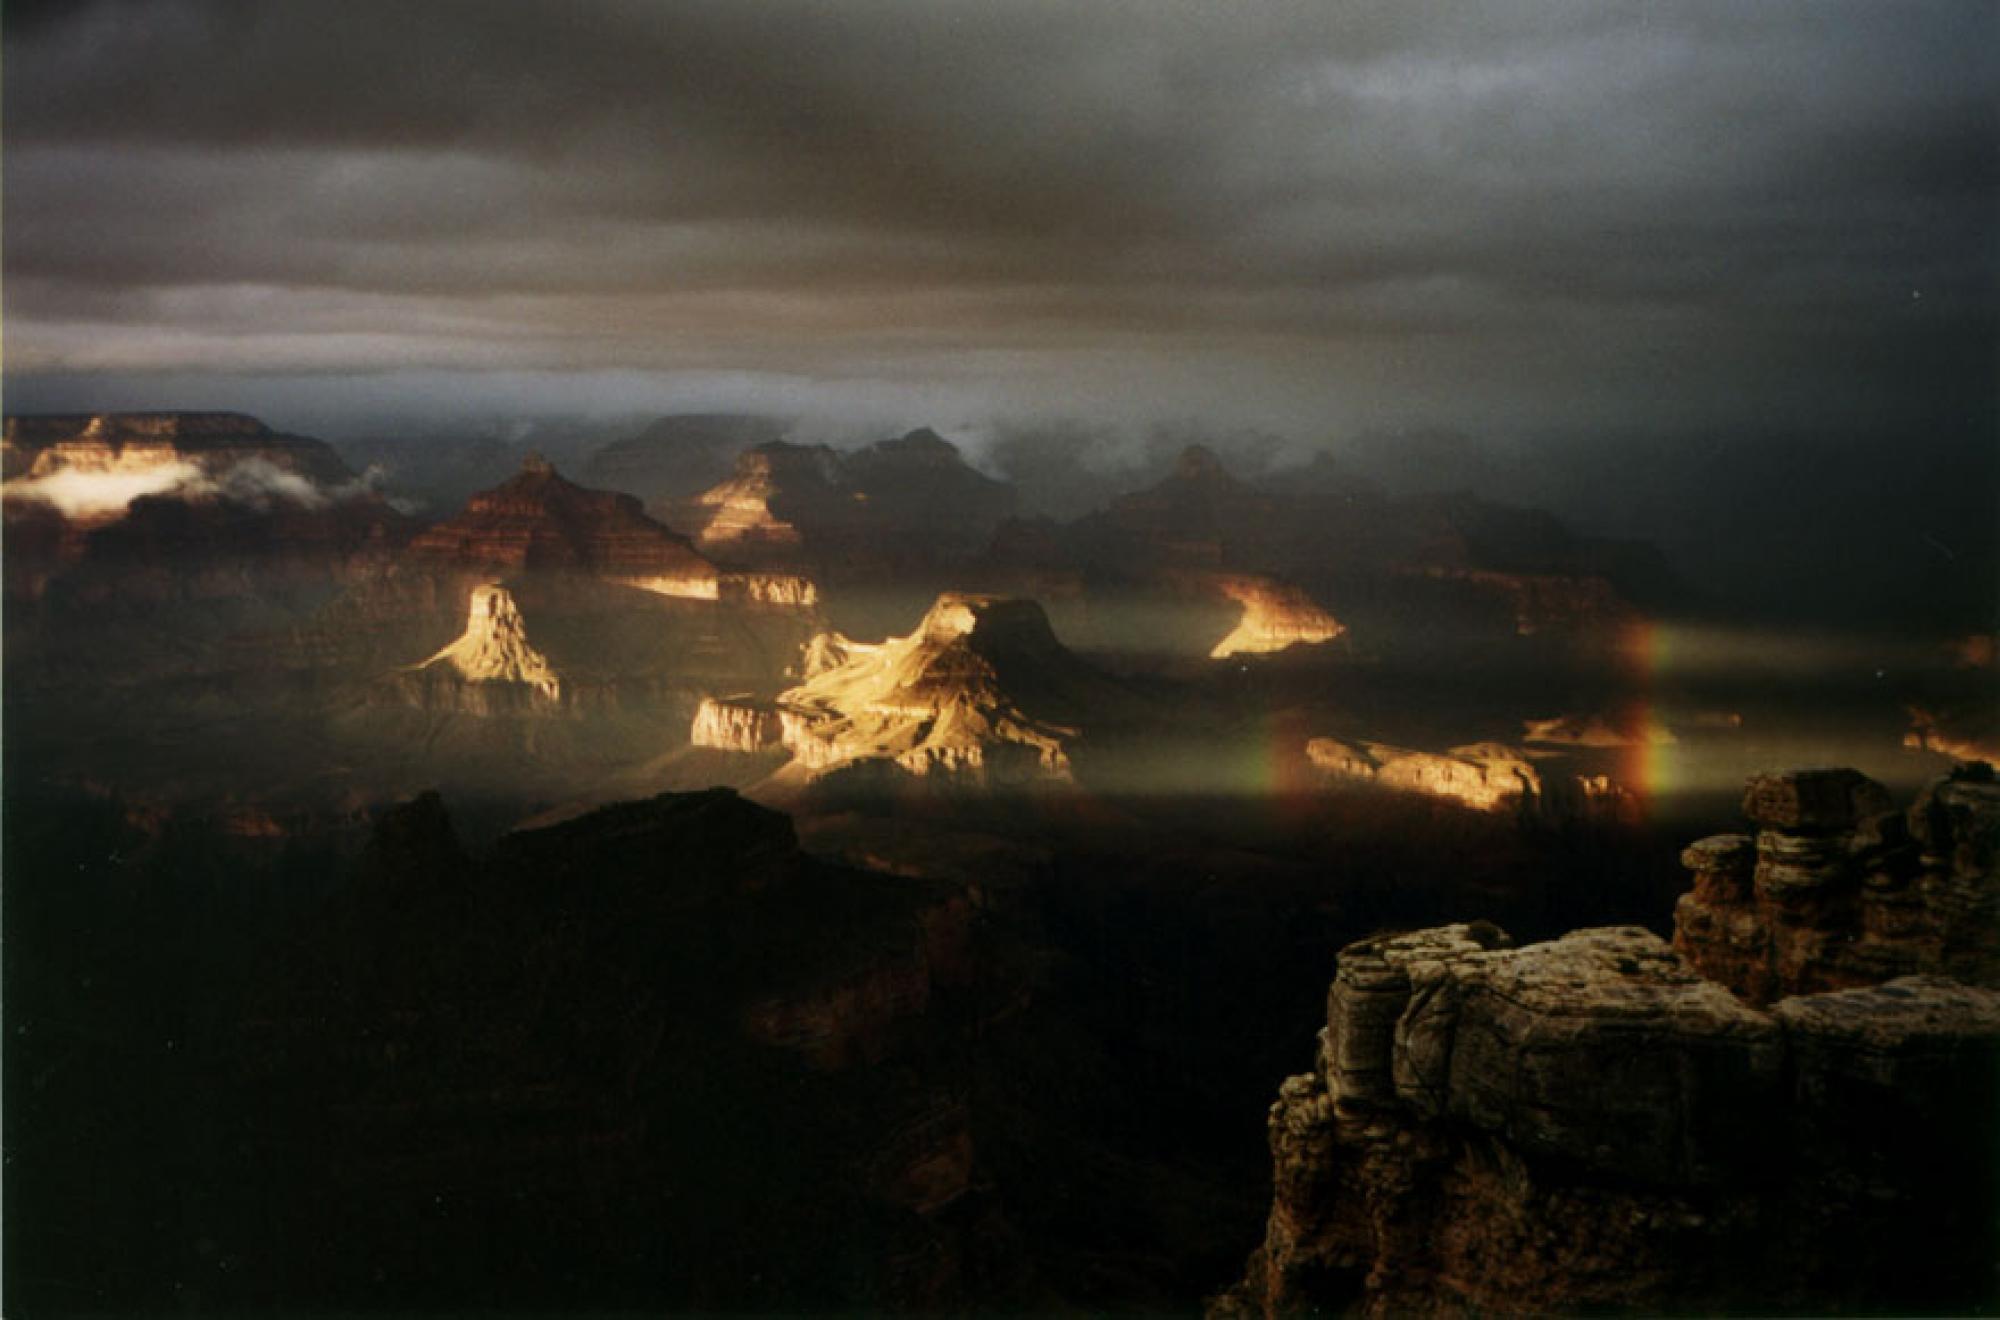 Storm over Grand Canyon, Arizona